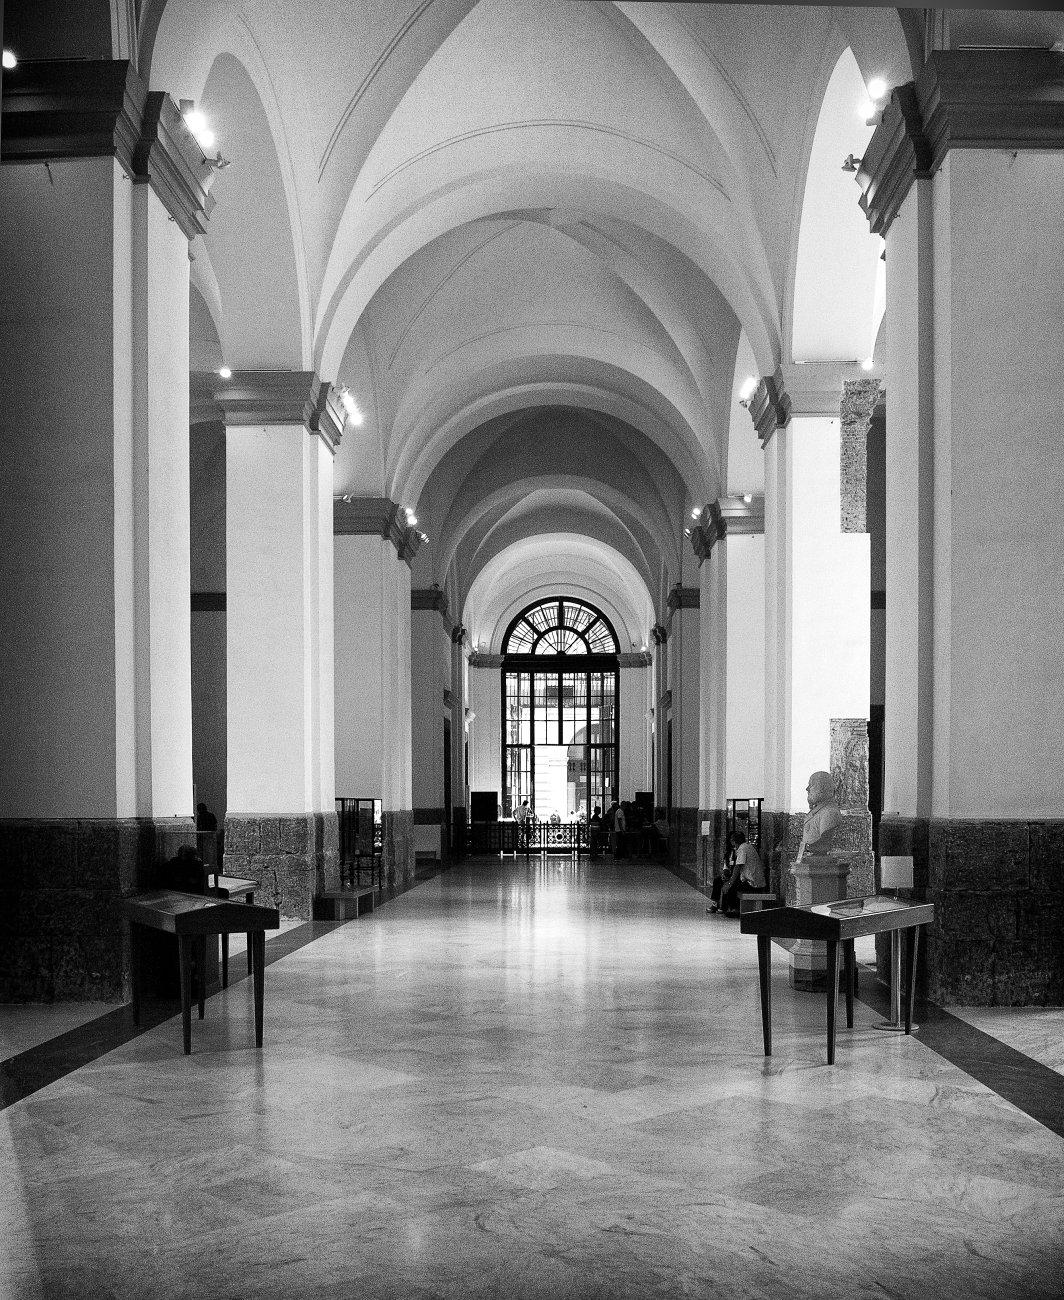 Pillars & Arches